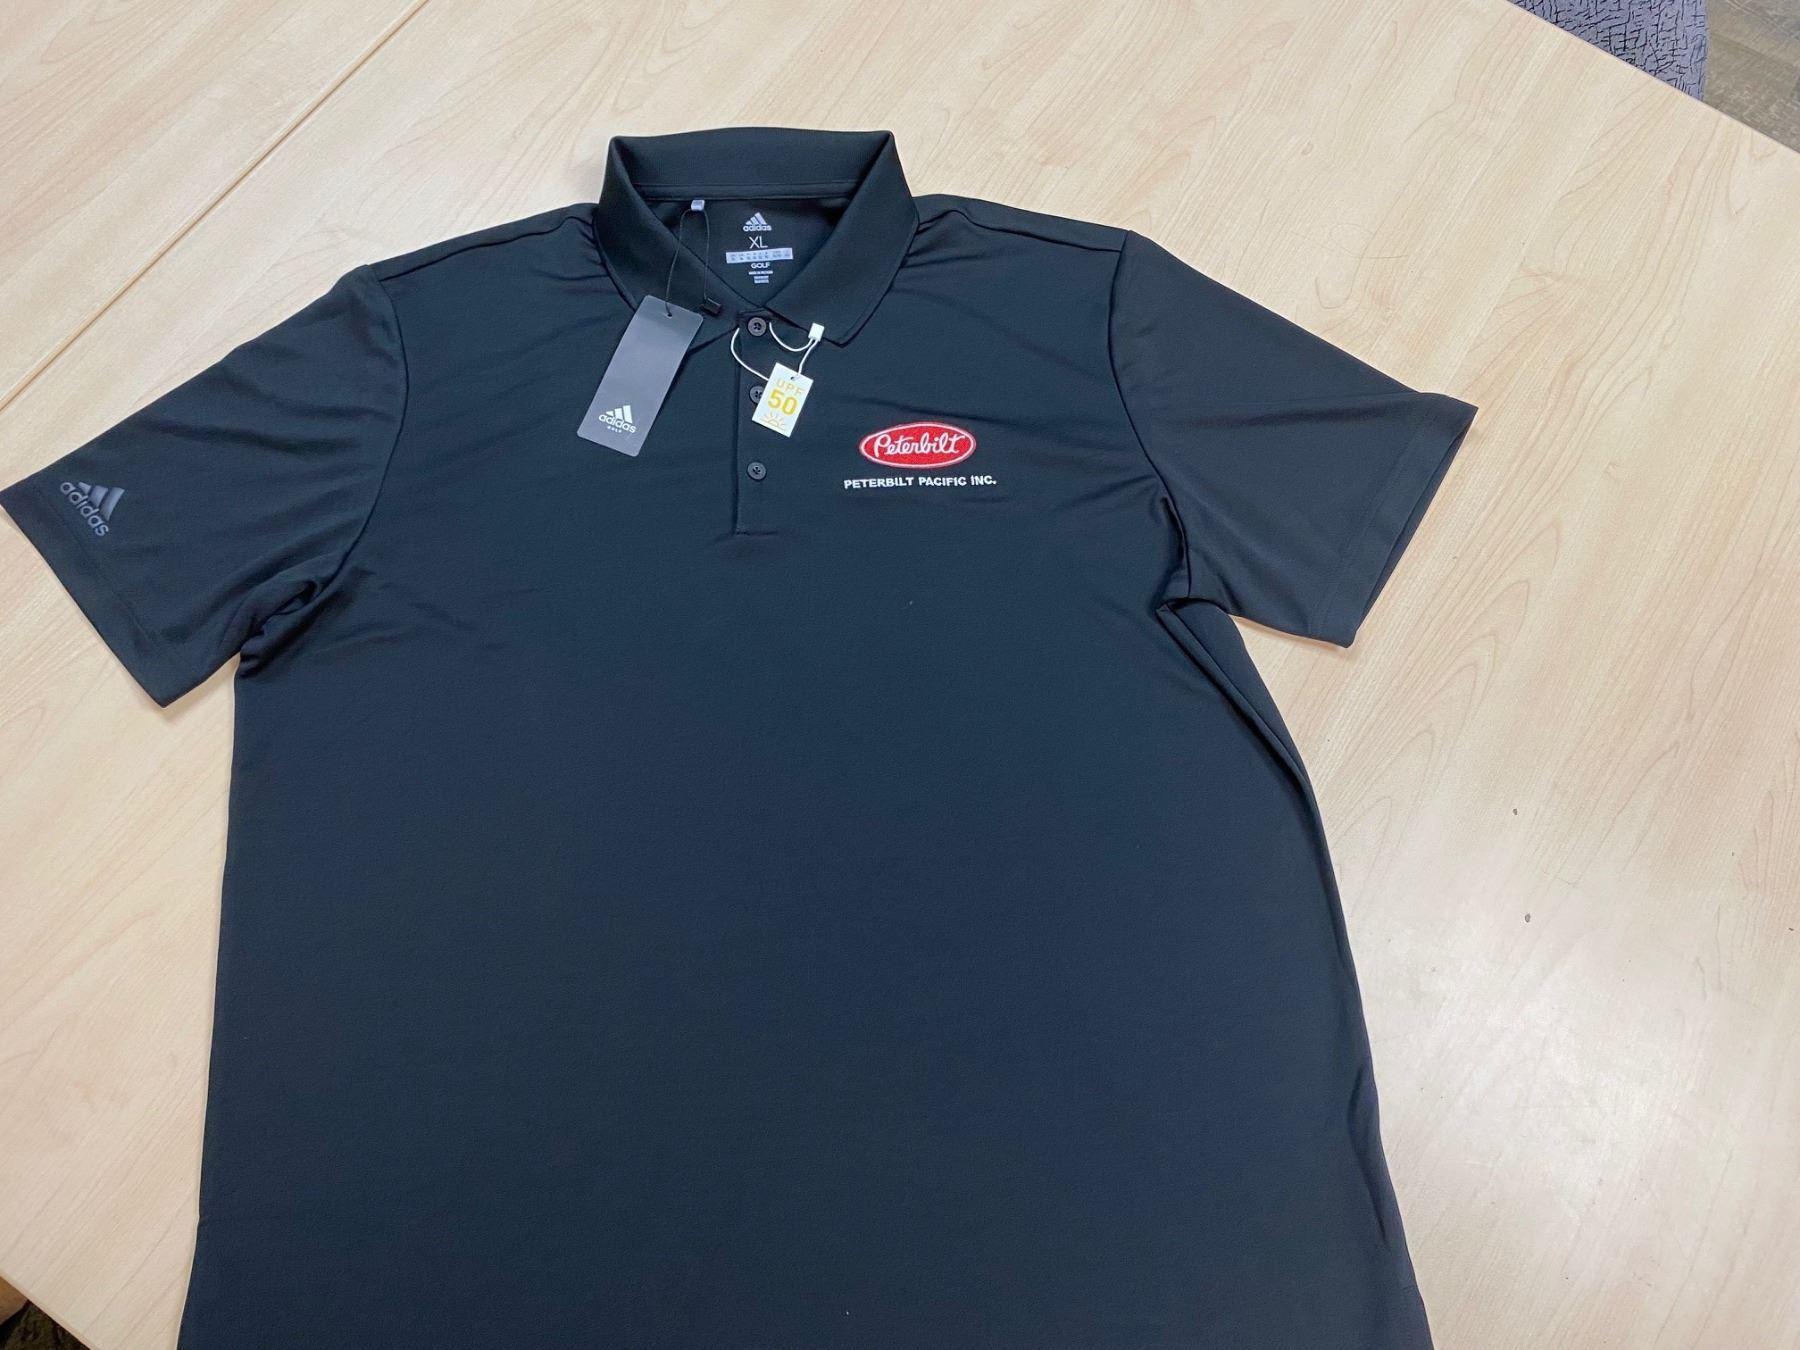 Men's Black Adidas Golf Shirt